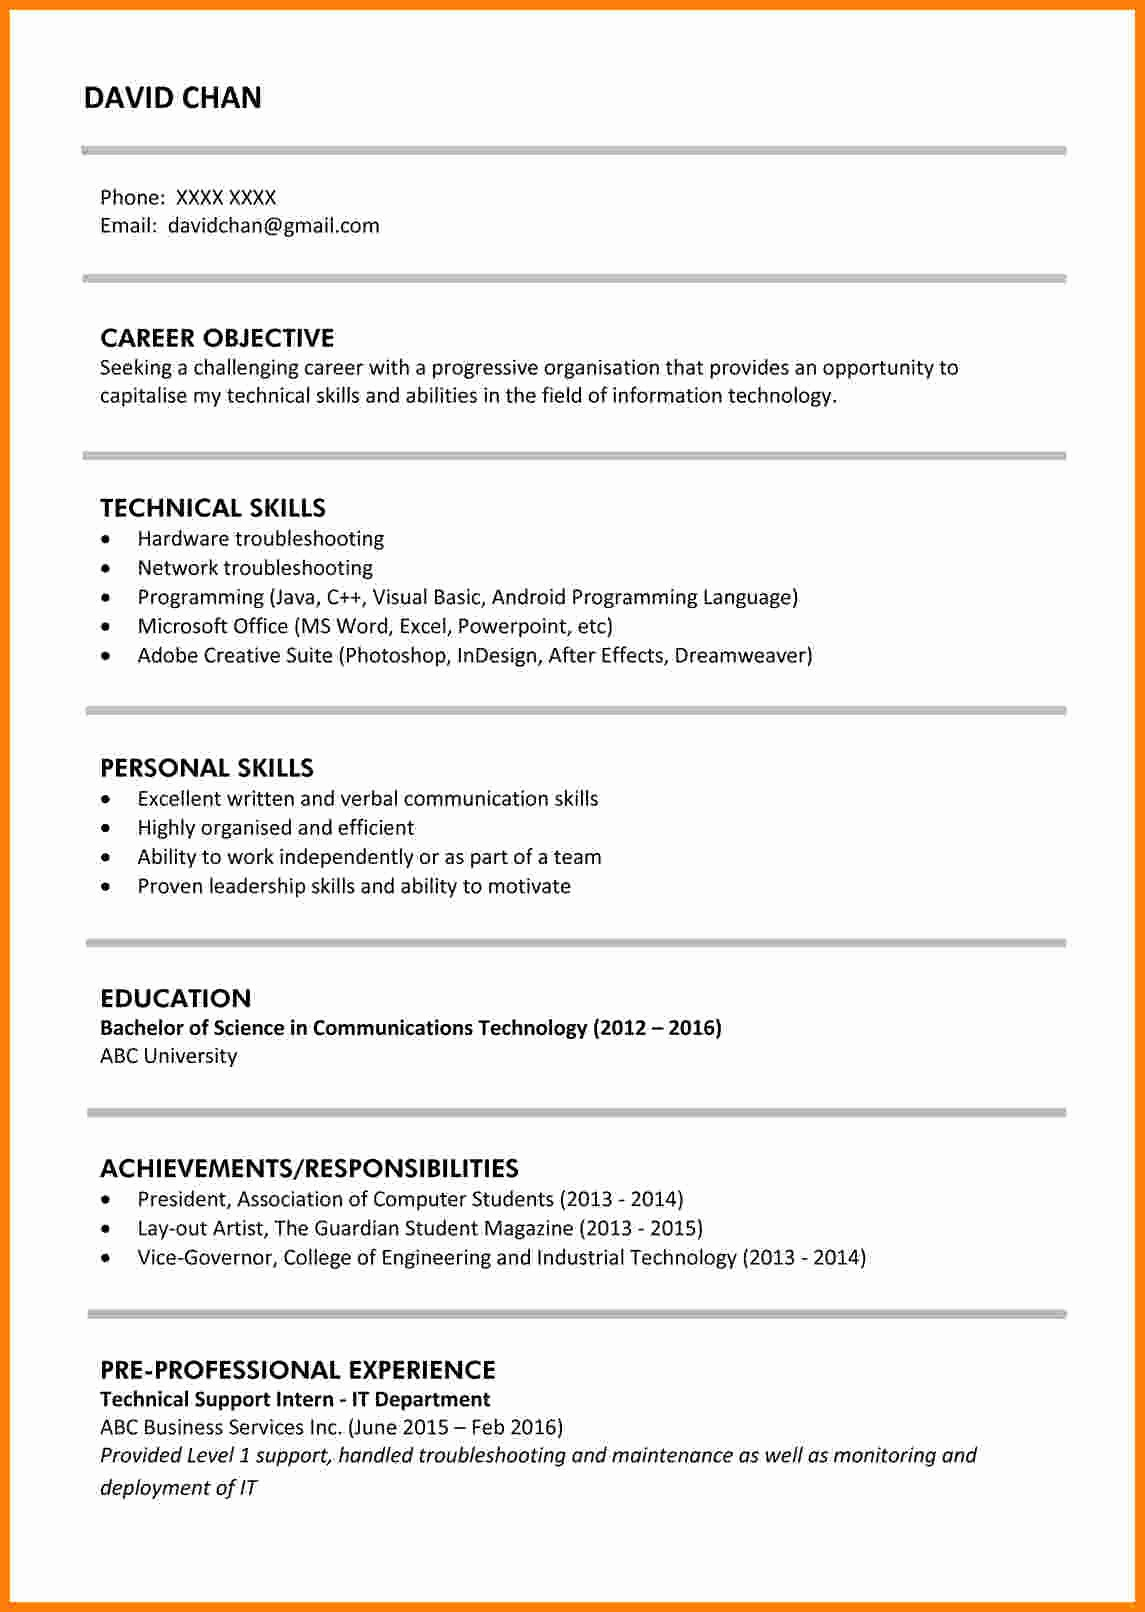 Resume Template for New Graduates Fresh 11 Cv Samples for Fresh Graduate